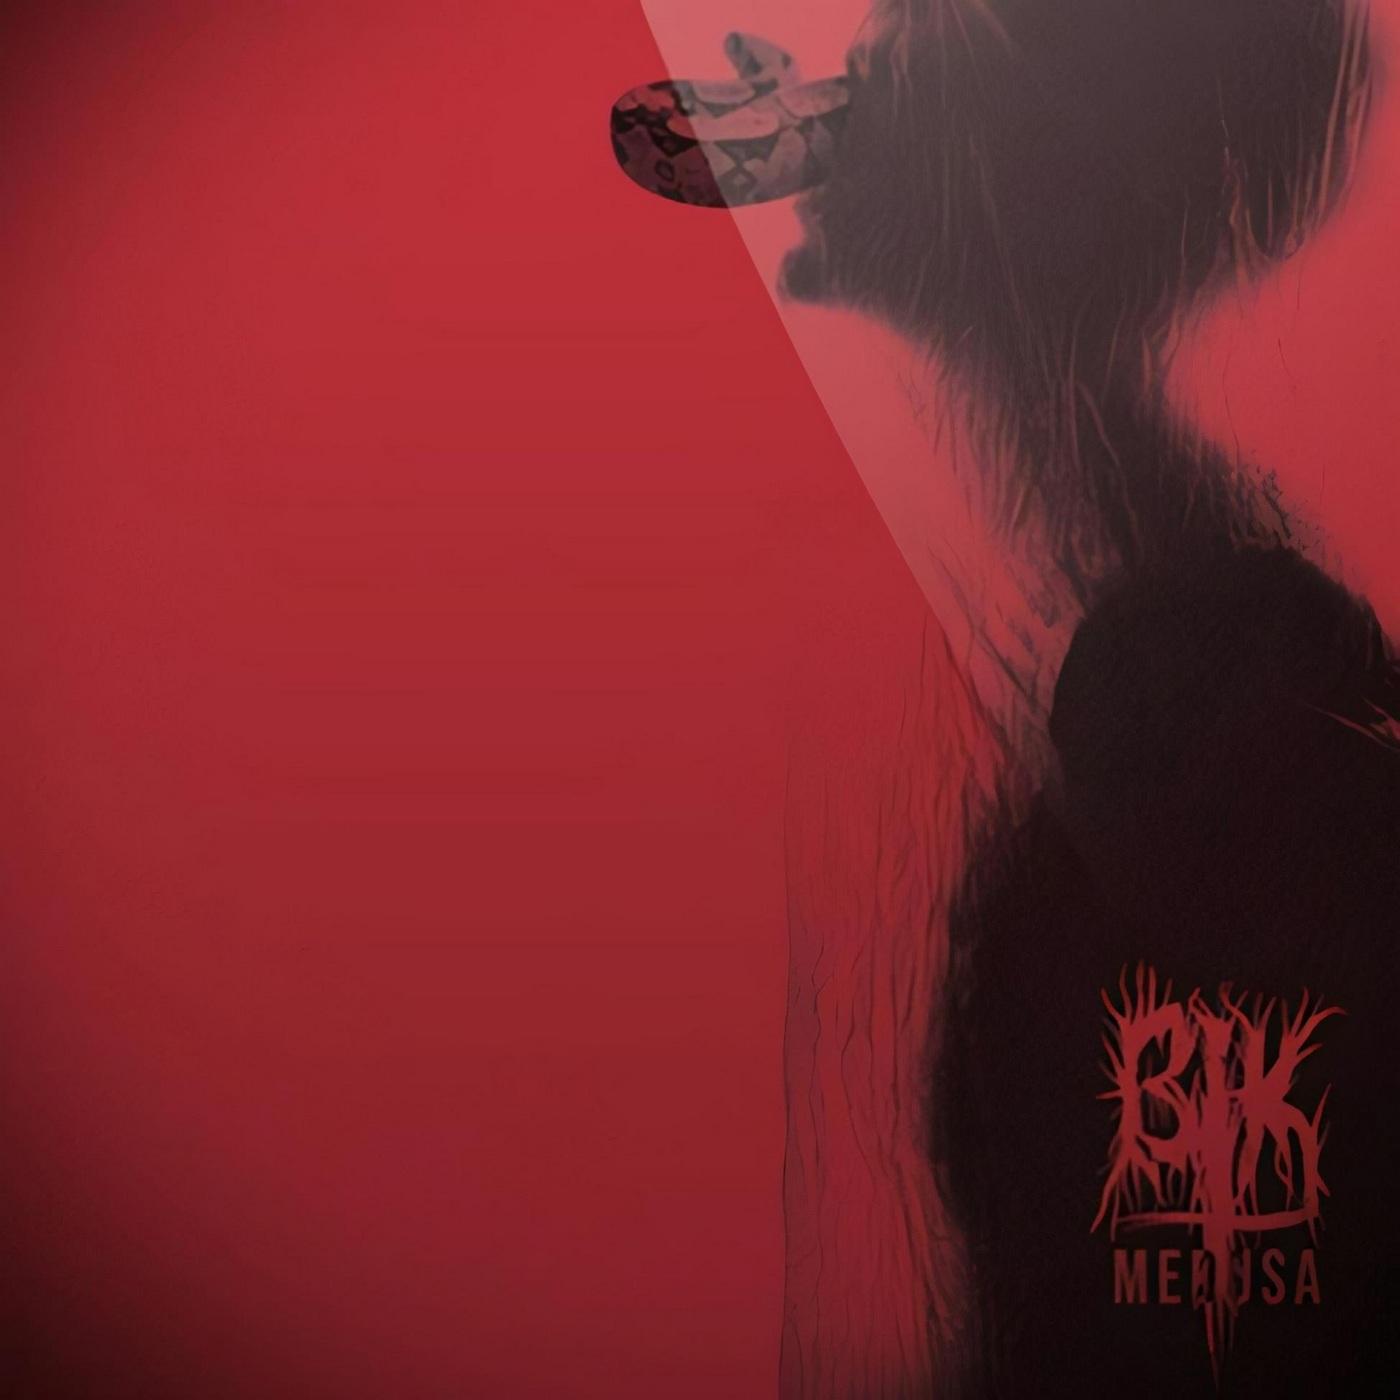 BTK - Medusa (2020)